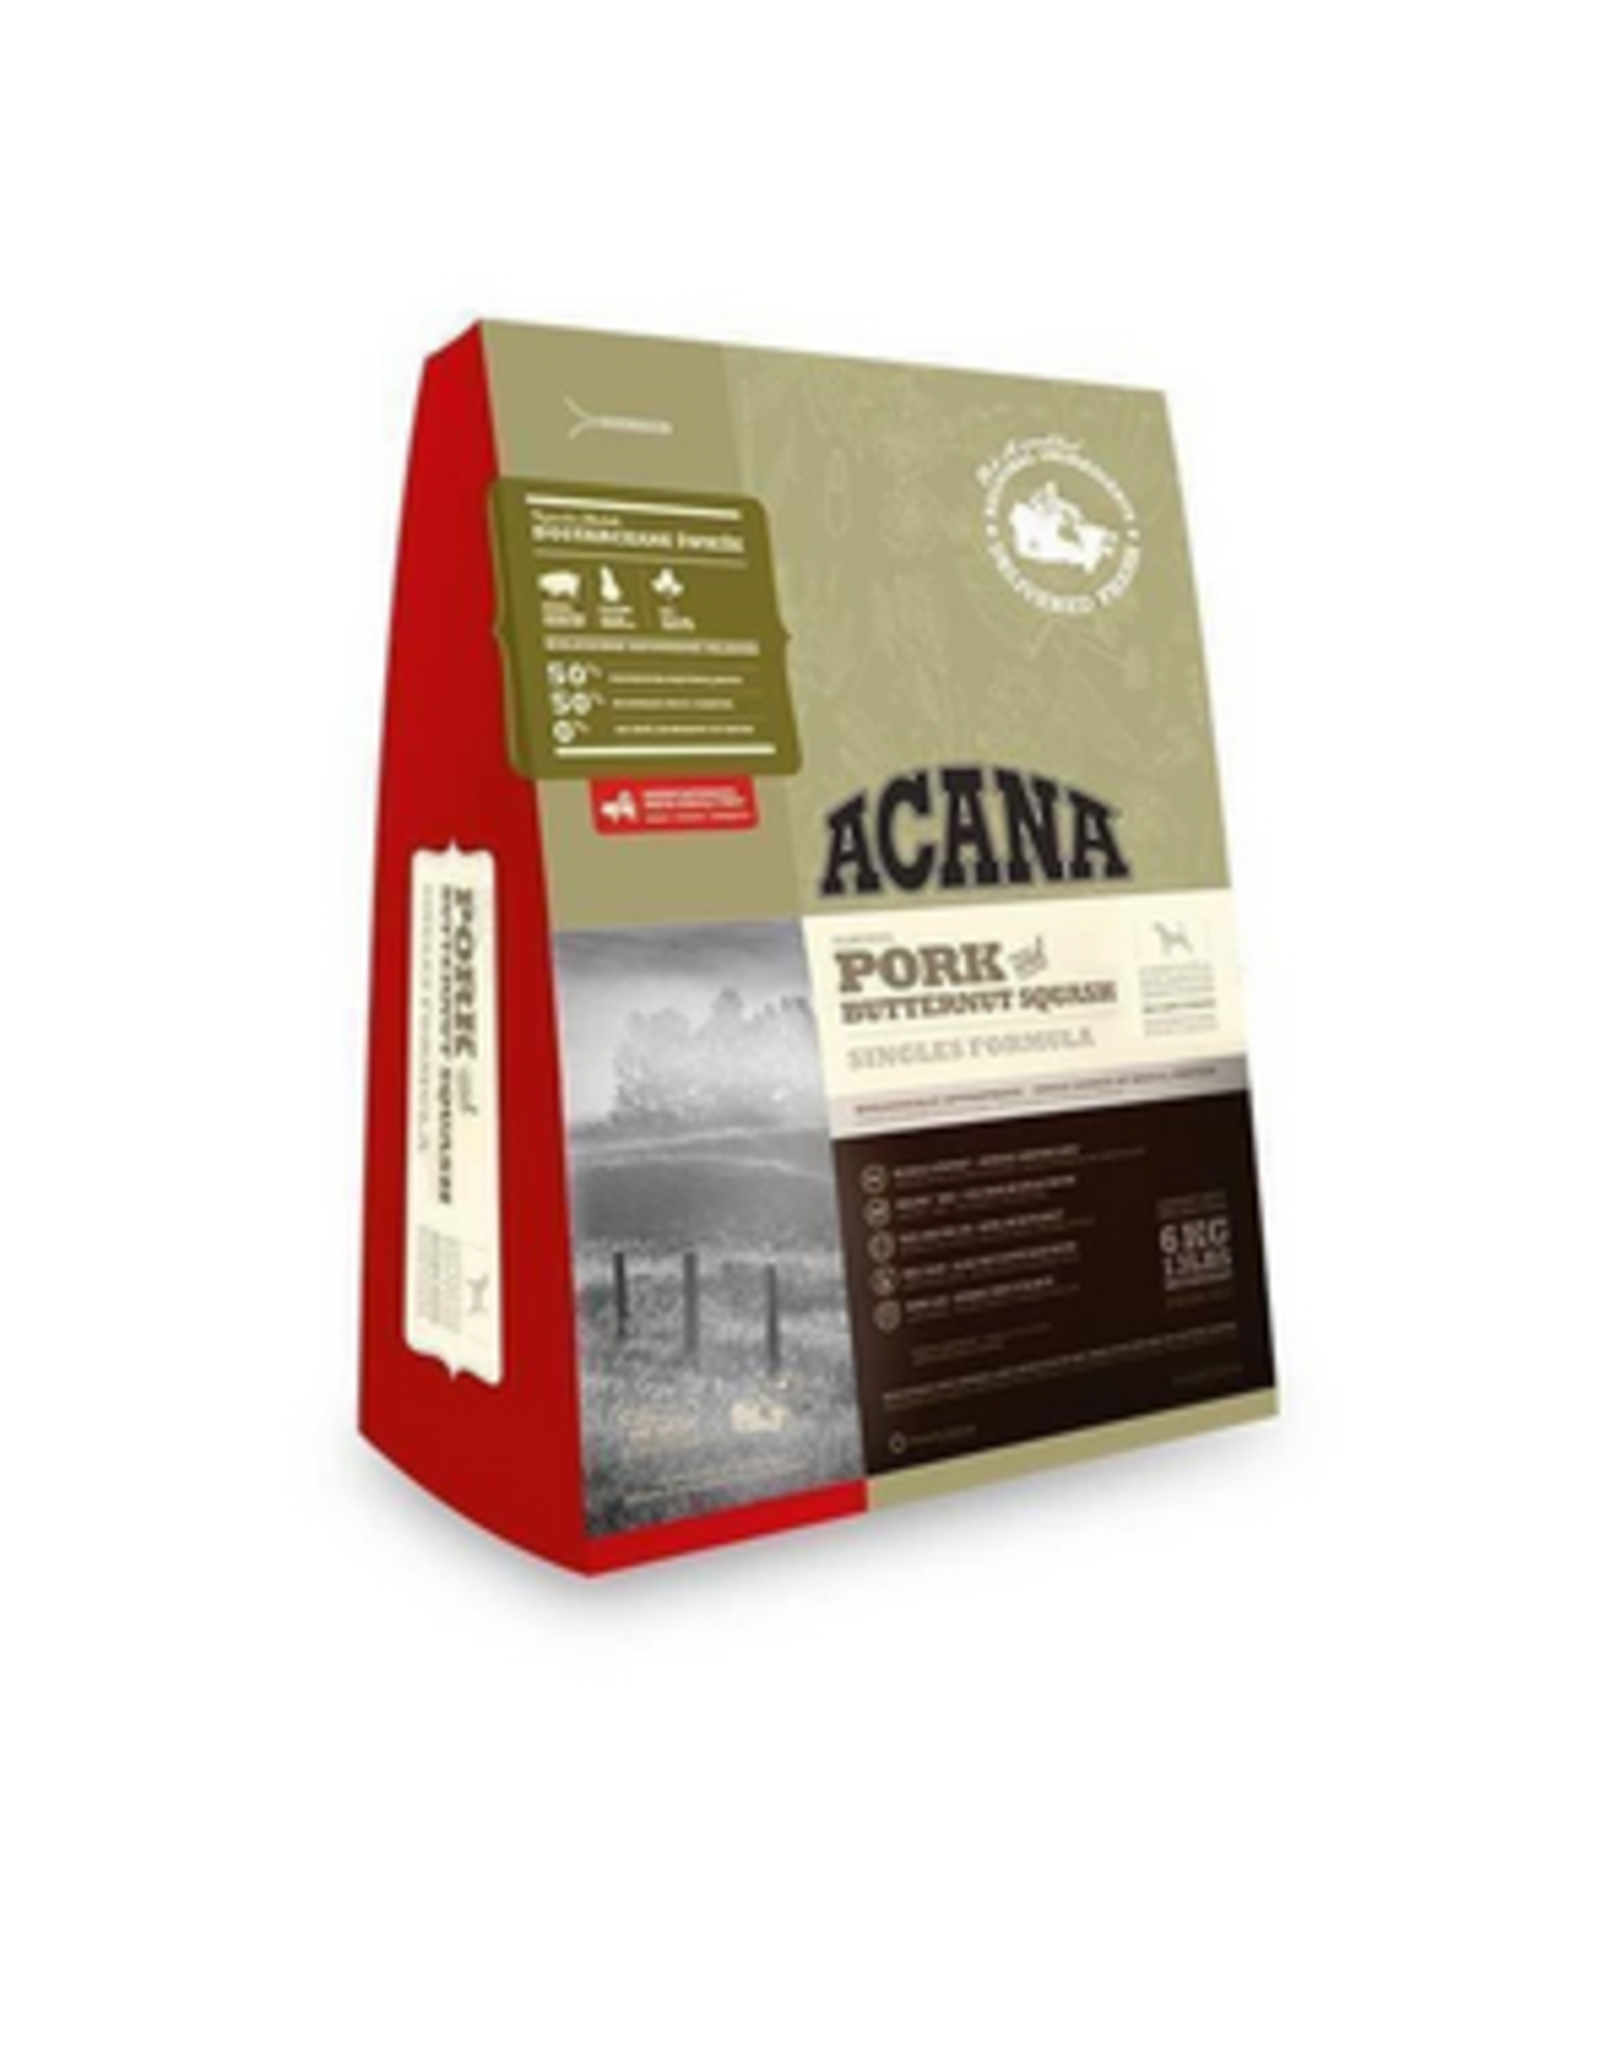 Acana Acana- Yorkshire Pork 2kg